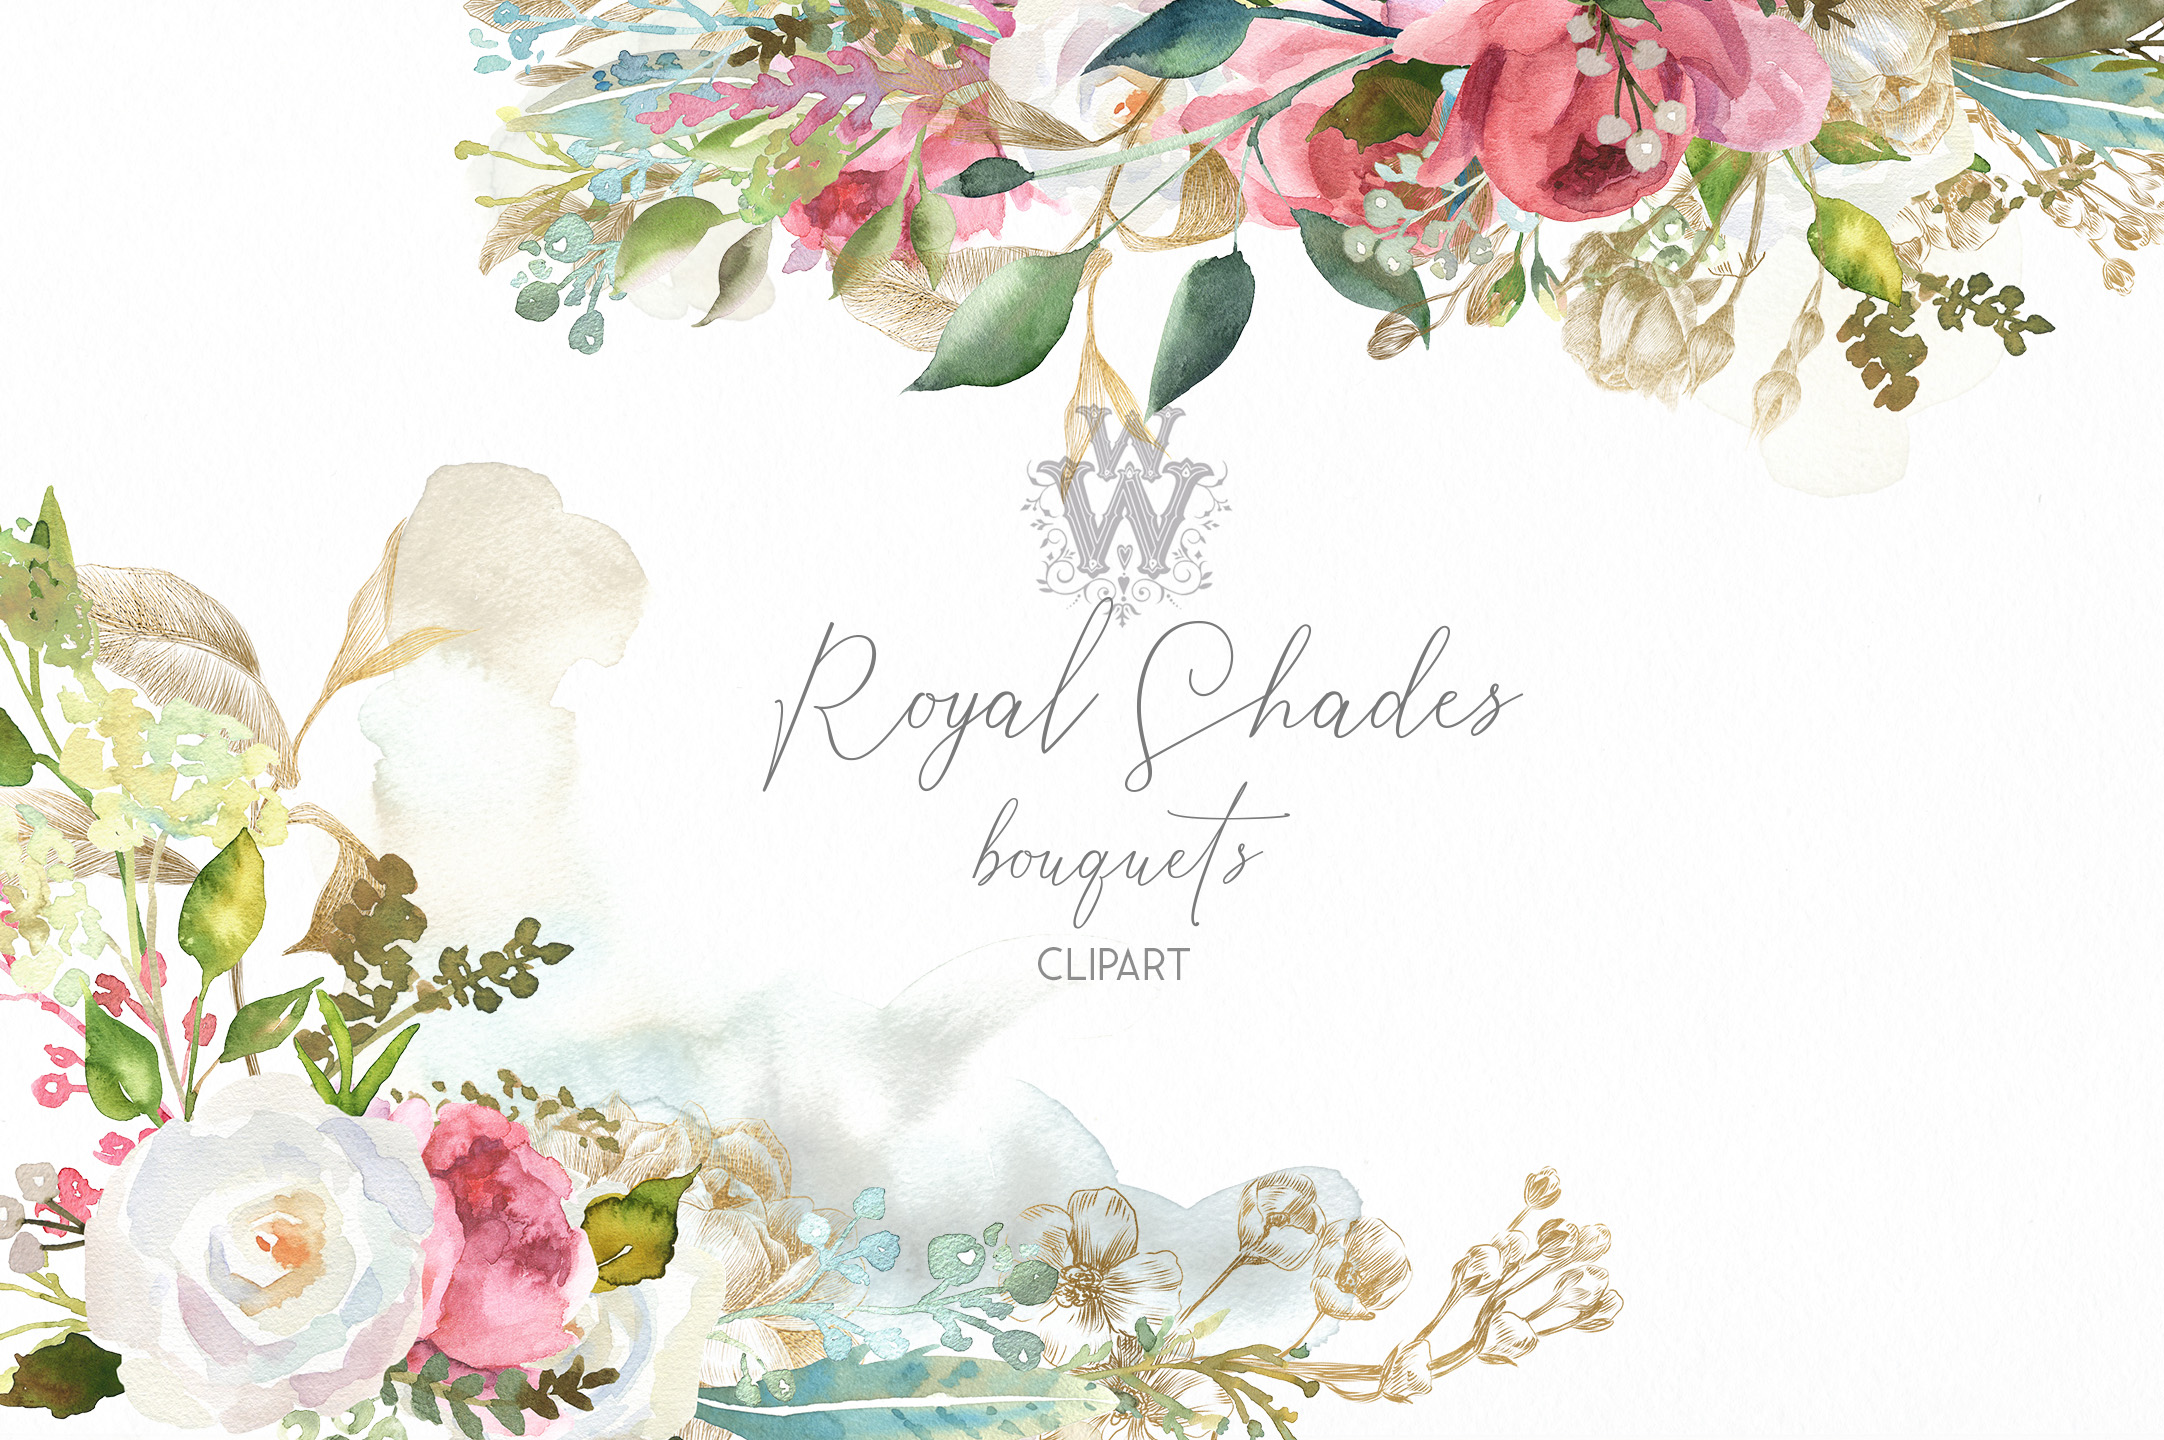 Watercolor rustic wedding bouquets clipart, vintage wreath example image 1